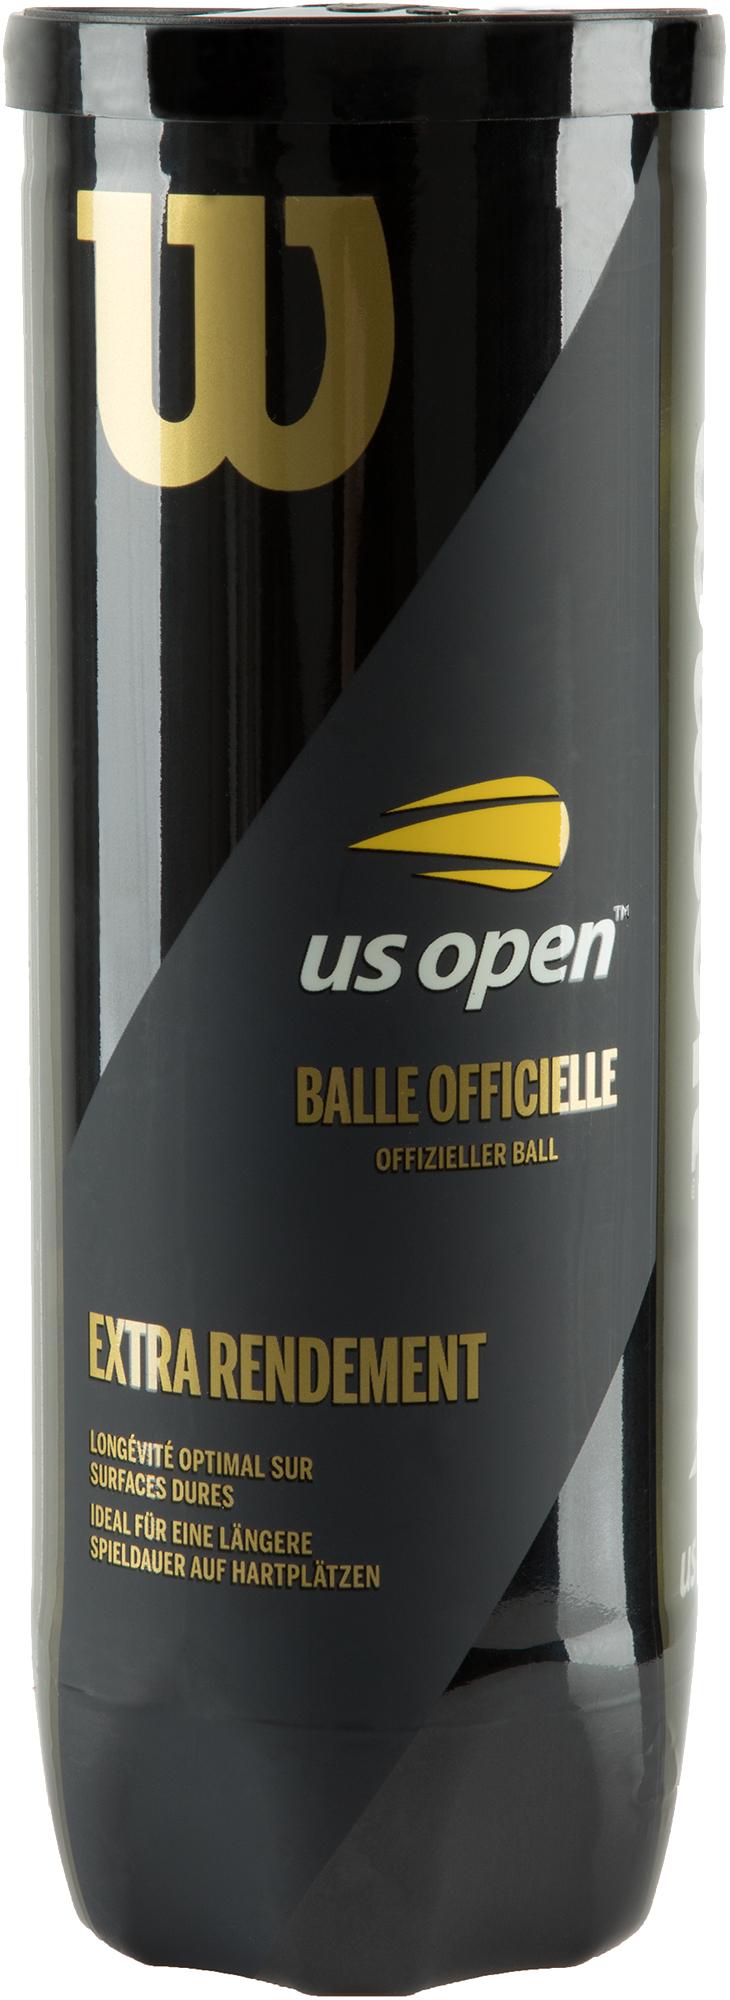 Wilson Набор мячей для большого тенниса Wilson US Open X3 wilson набор мячей для большого тенниса wilson australian open 3 ball can размер без размера